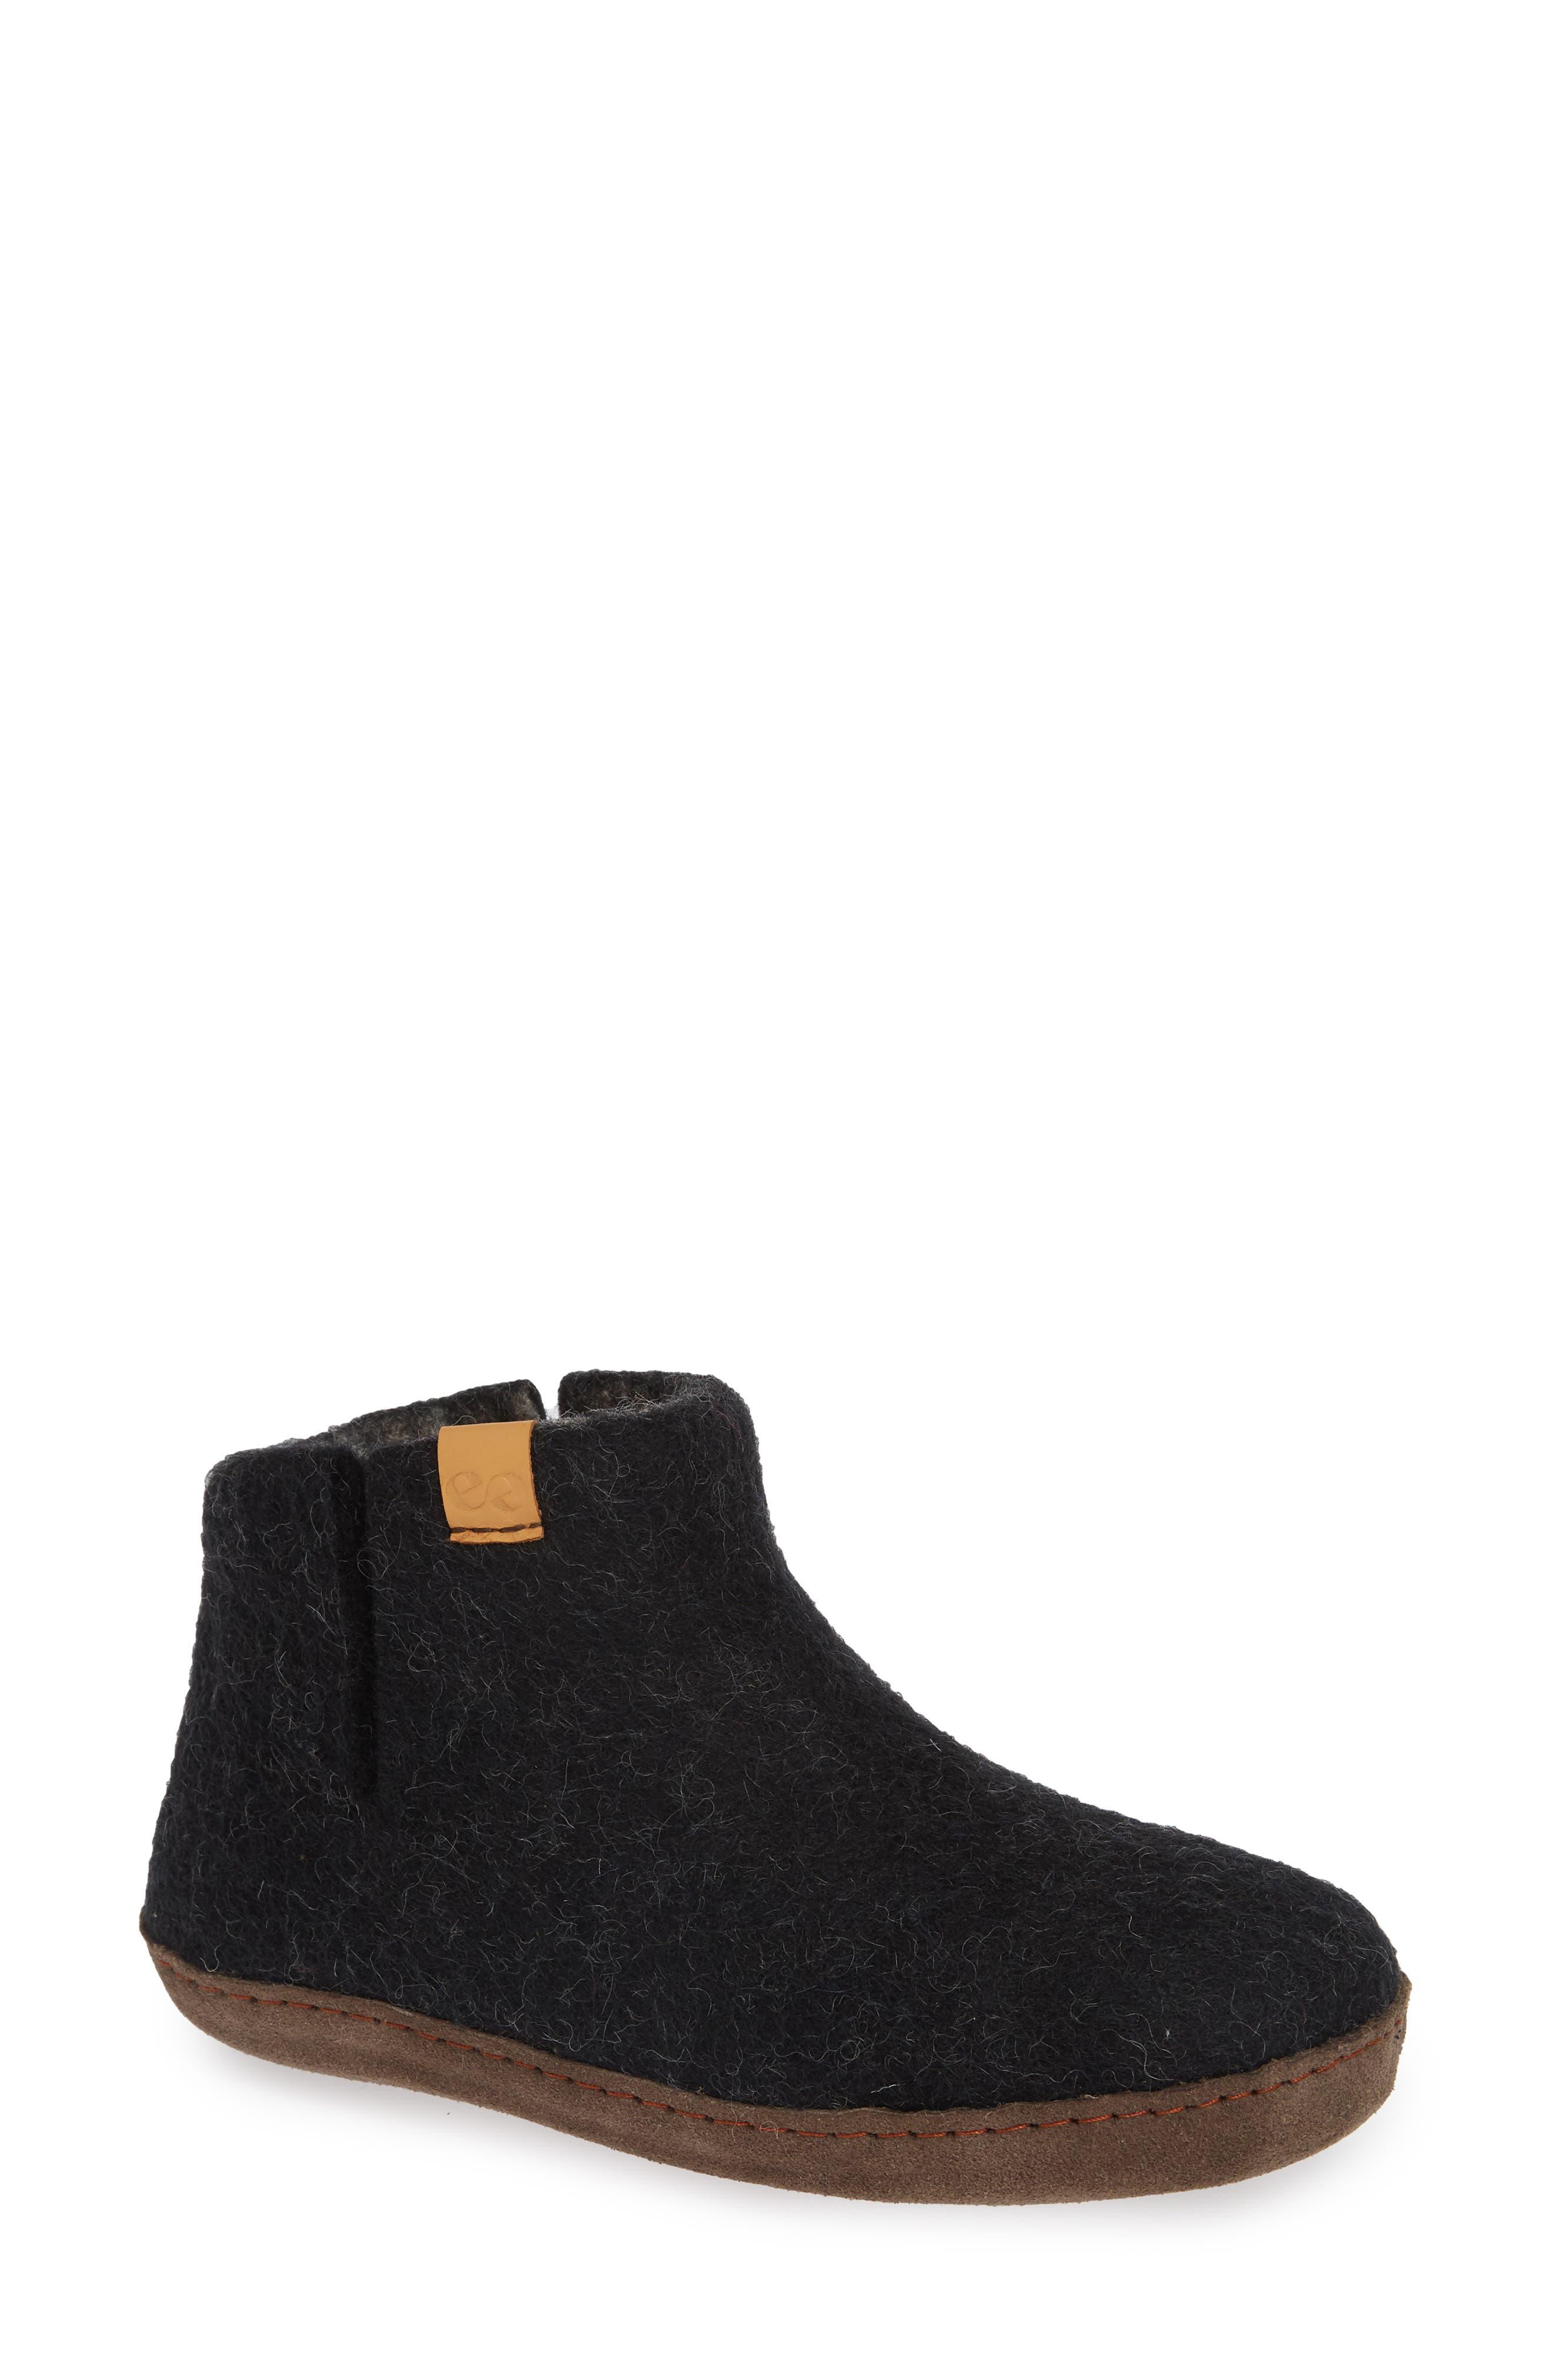 Everest Wool Slipper,                             Main thumbnail 1, color,                             BLACK WOOL